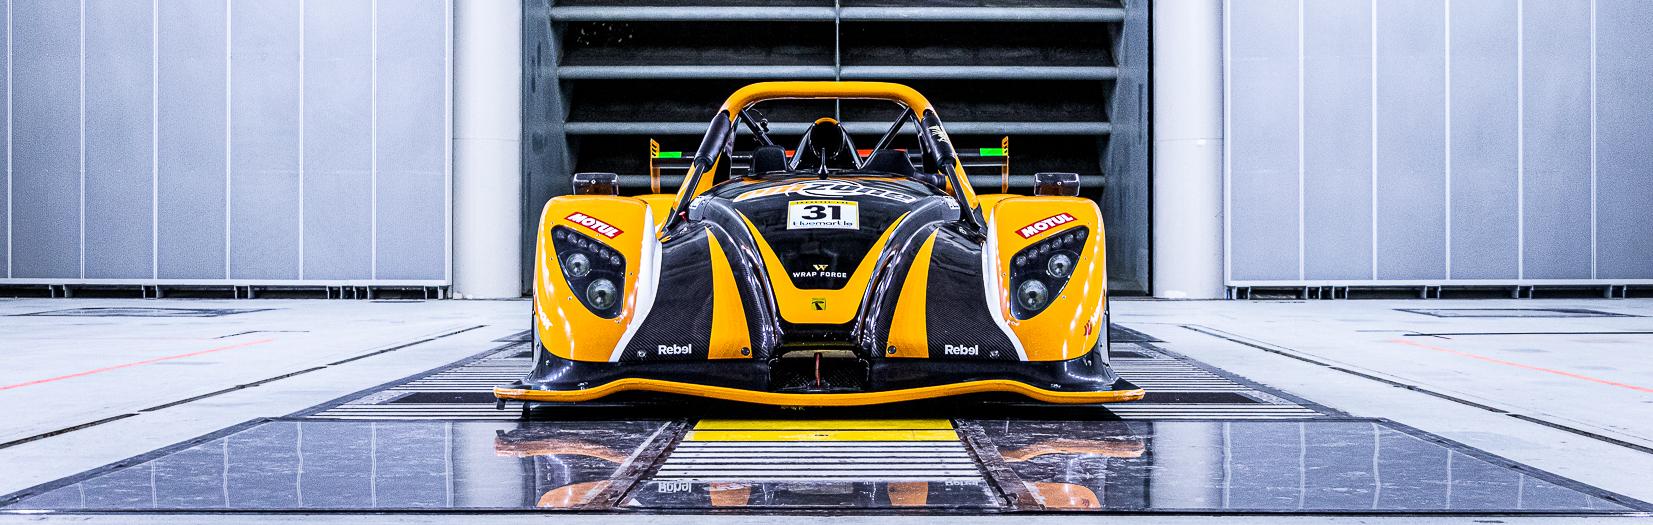 CTW Race Car